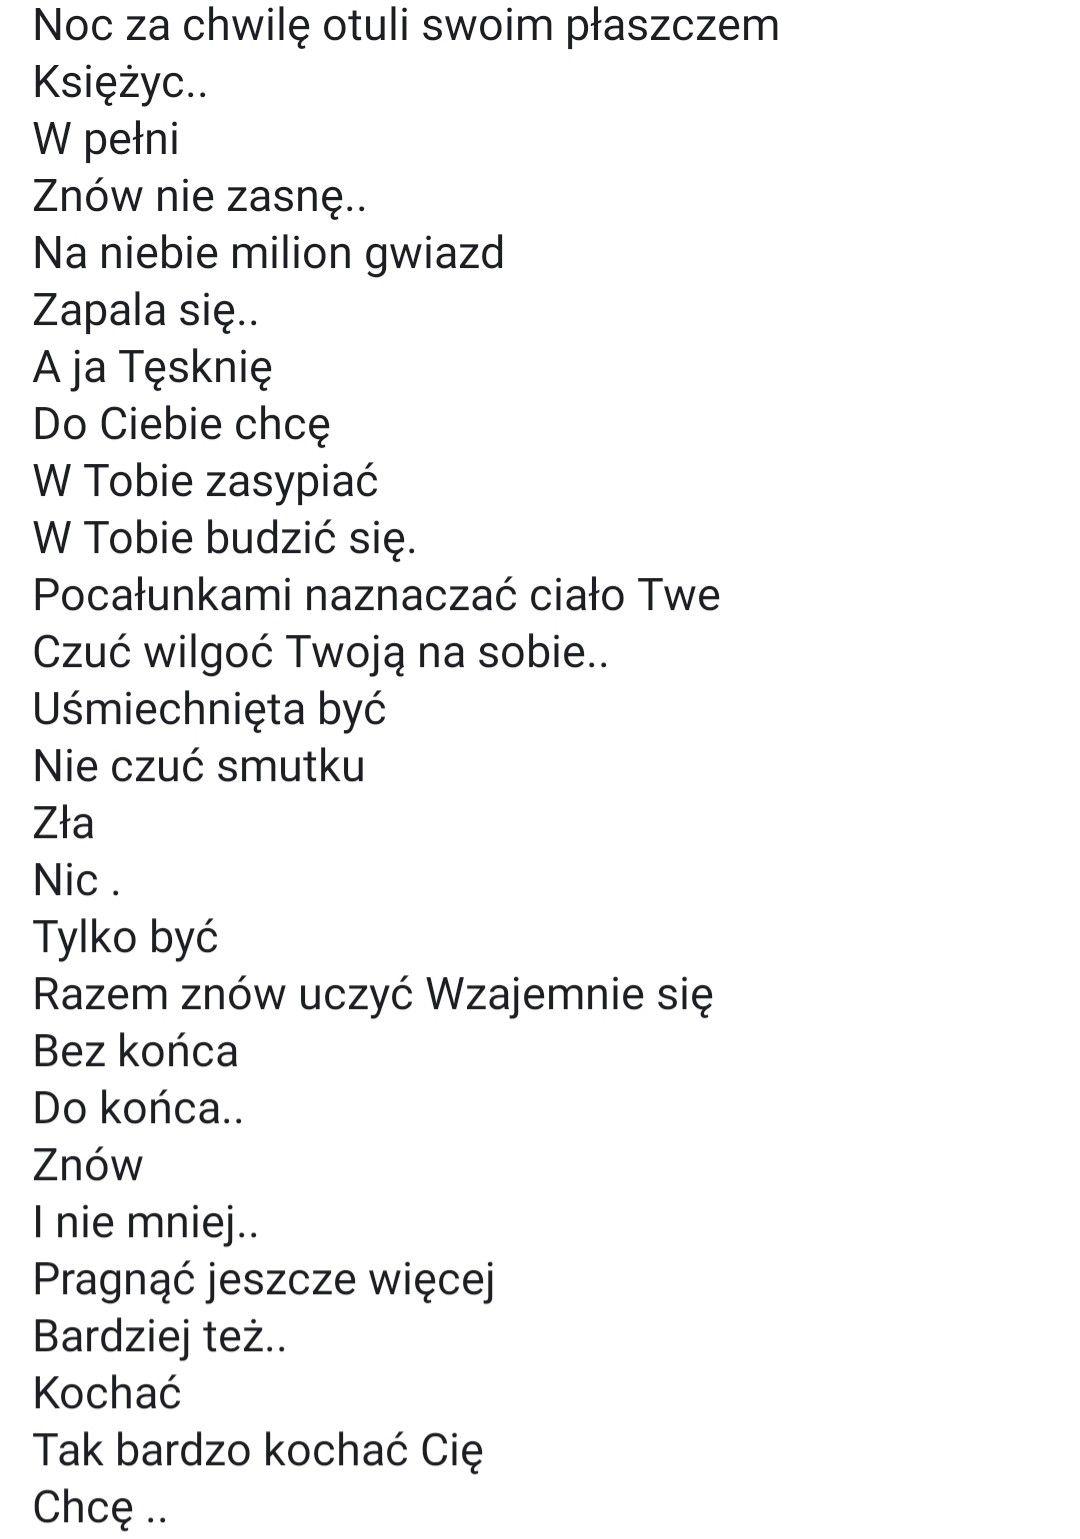 Pin Na Piekne Mysli I Slowa